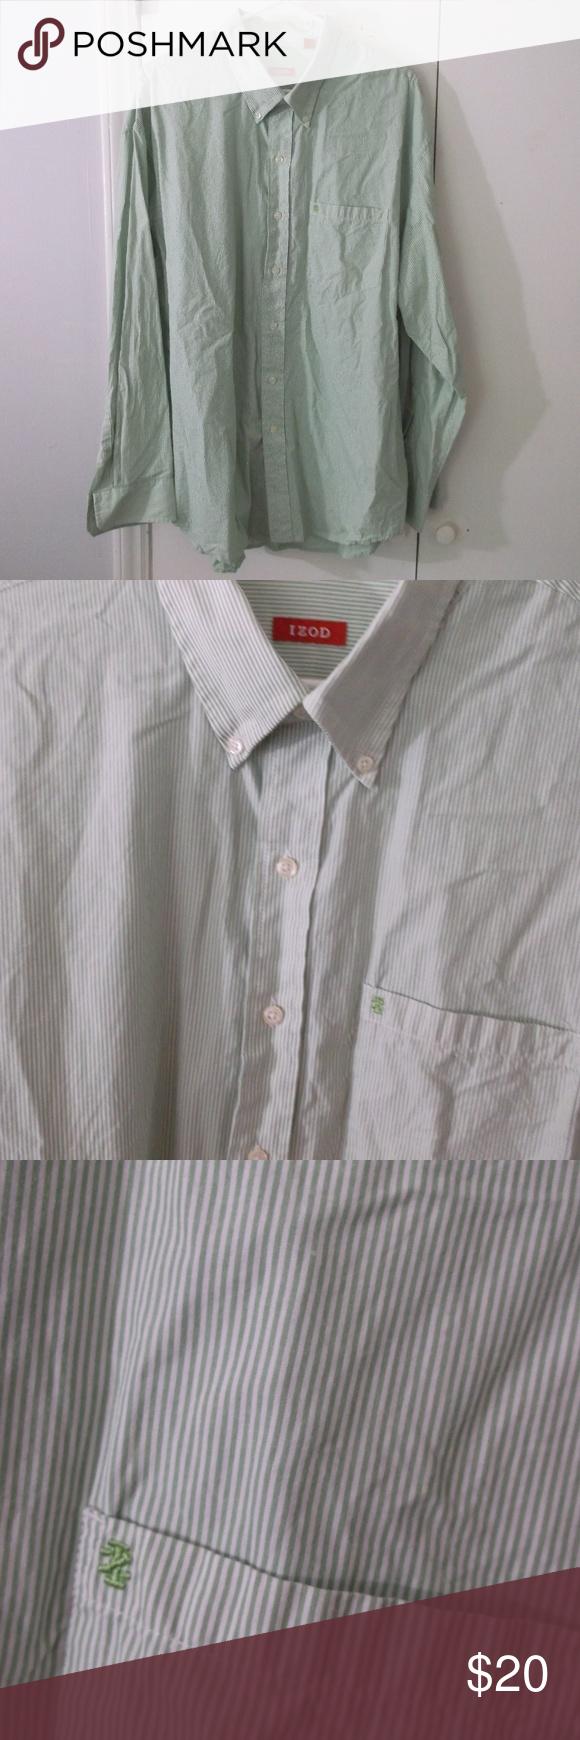 Green dress shirt mens IZOD Green Pinstripe Dress Shirt XXL Long Sleeve  My Posh Closet